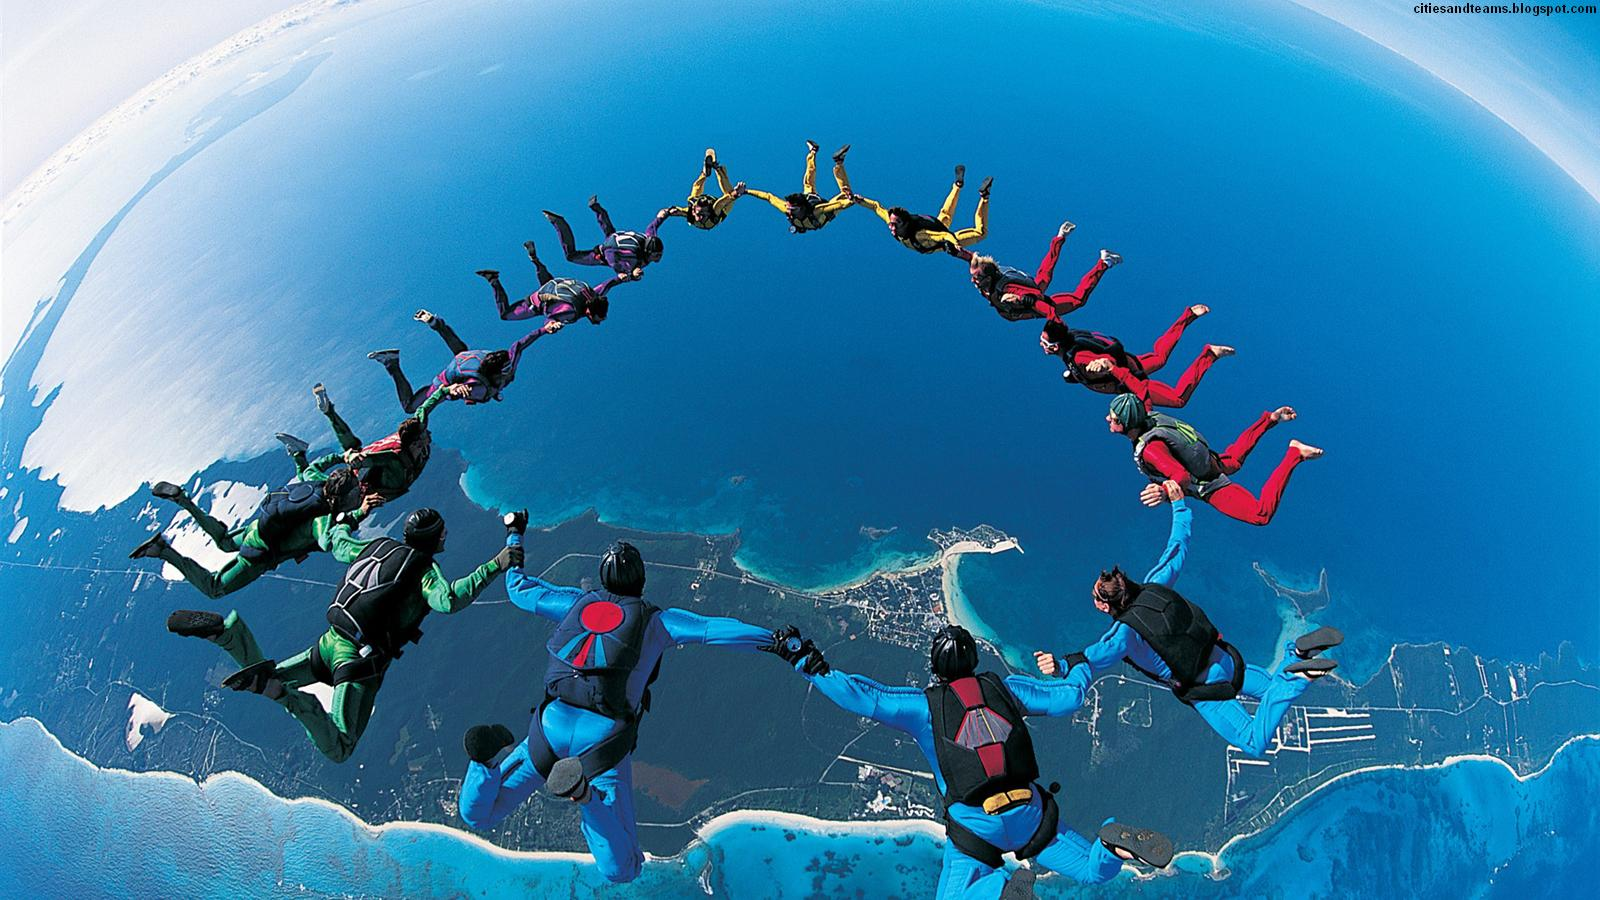 Jumping Photo Extreme Sports Amazing Atmosphere Hd Desktop Wallpaper 1600x900